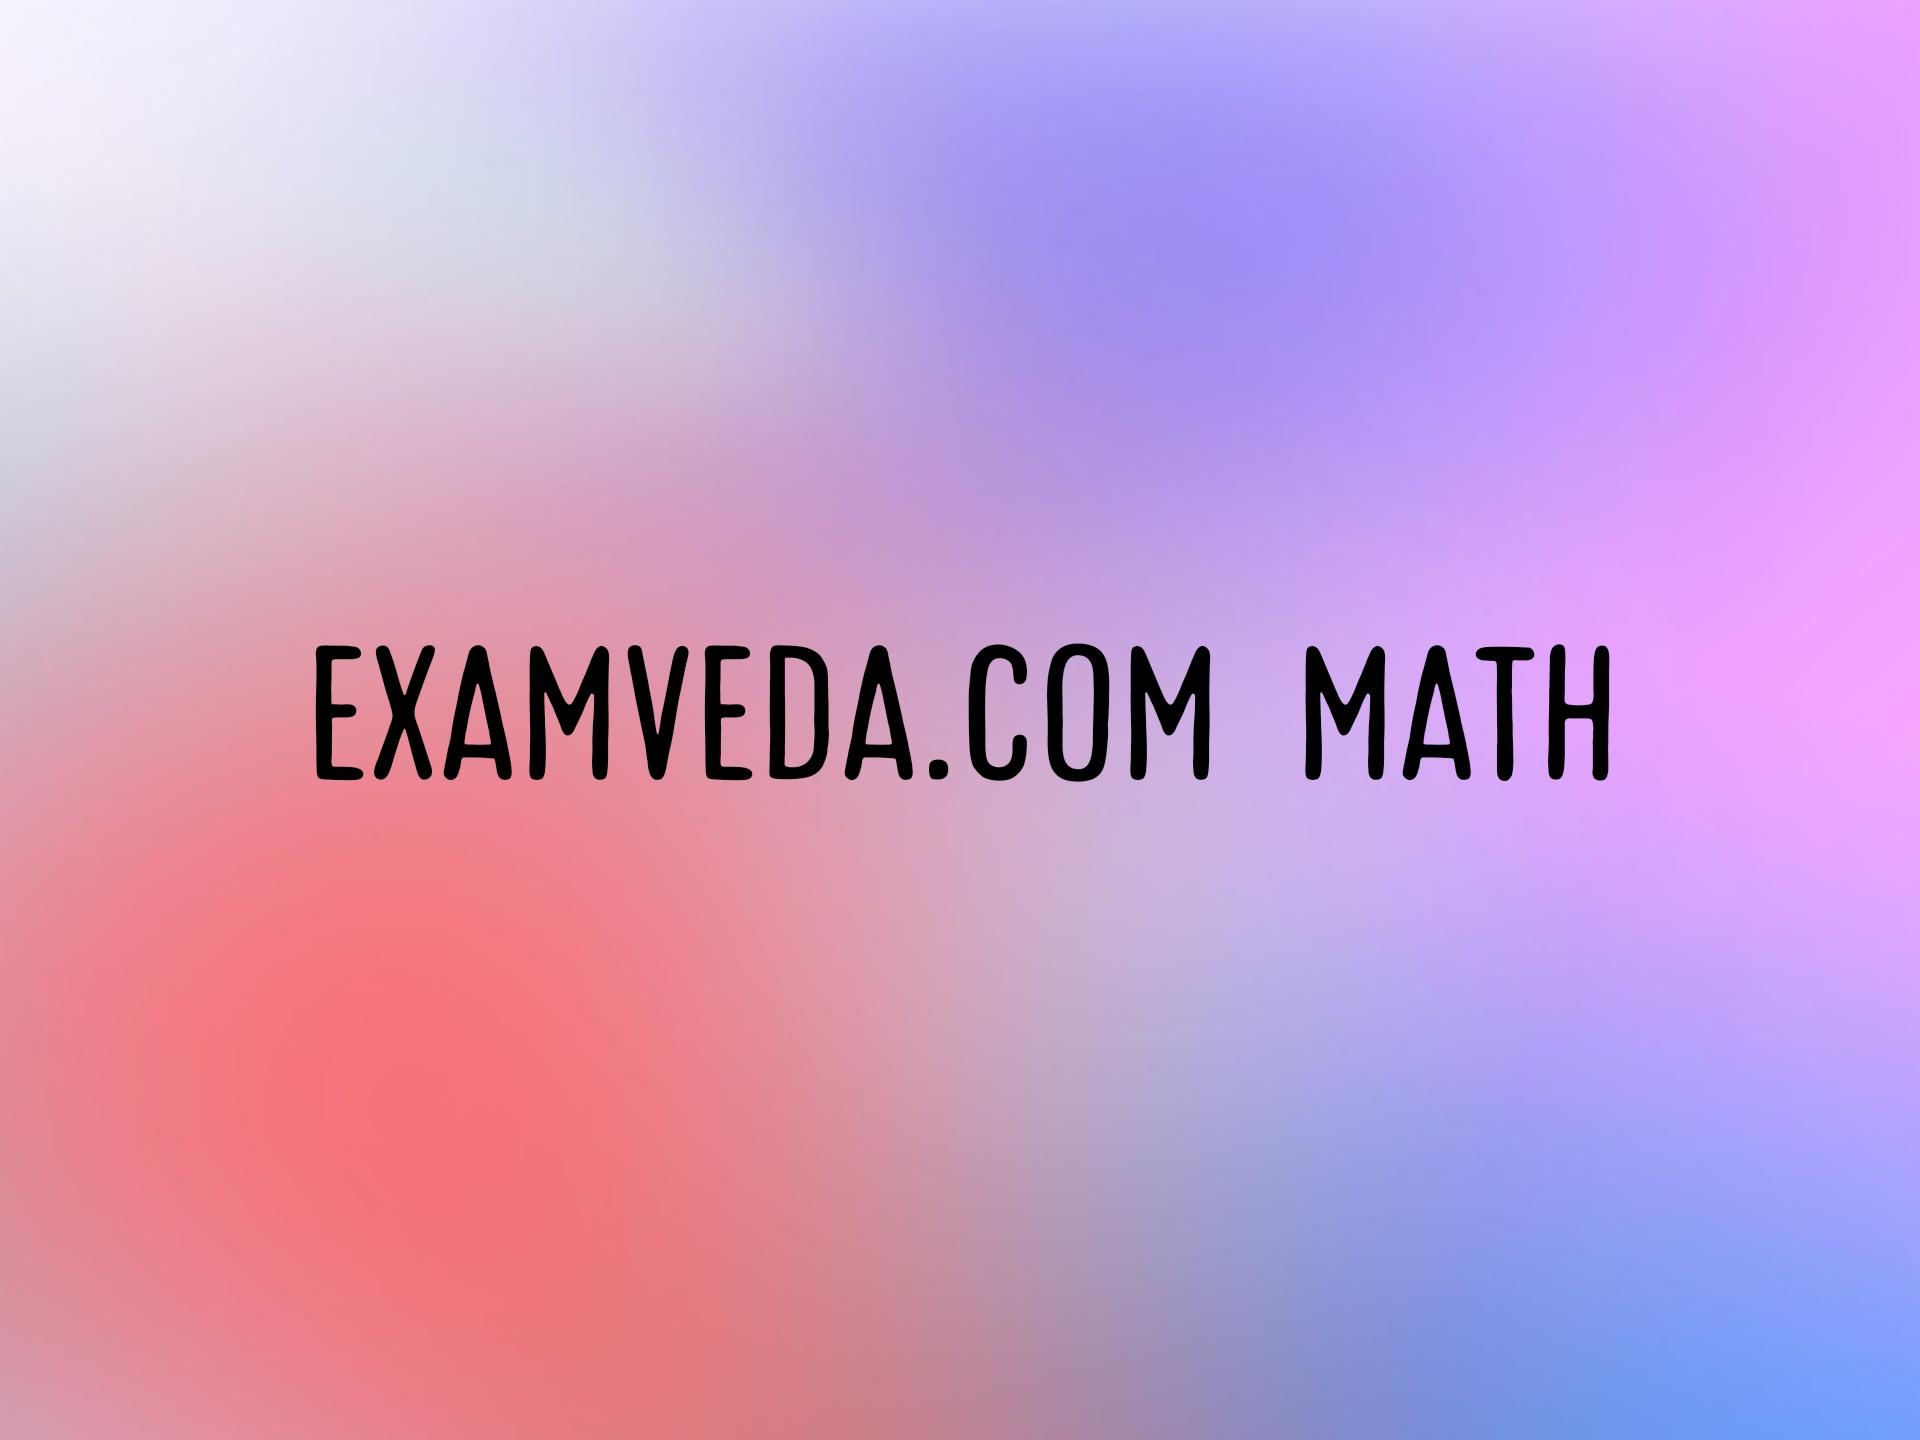 Eaxmveda math, এক্সামভিডা ম্যাথ, Examveda math link, average examveda link,mcq examveda link.